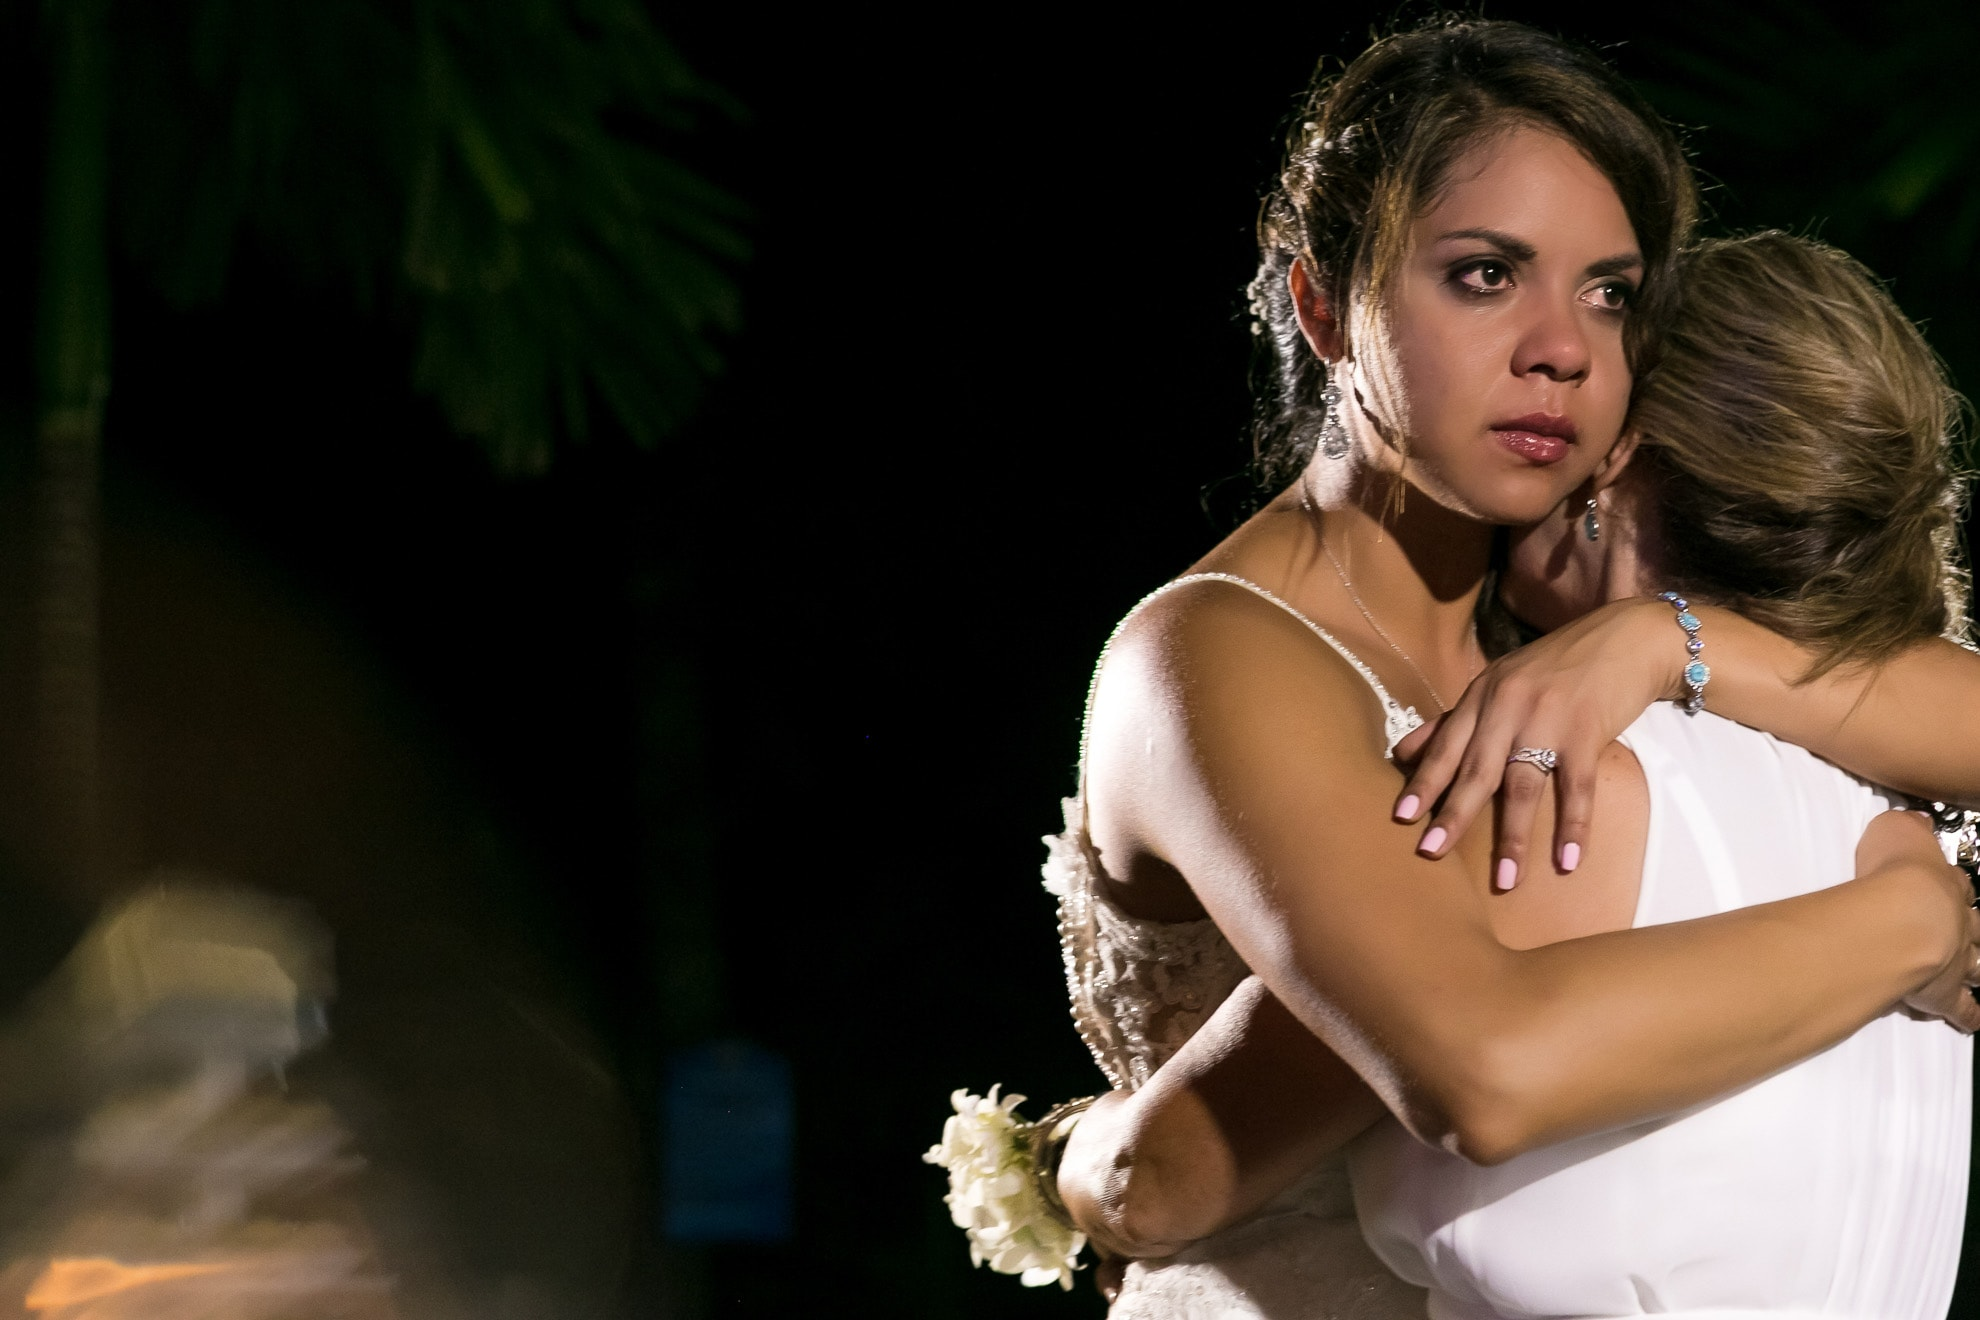 Bride hugs mother at wedding